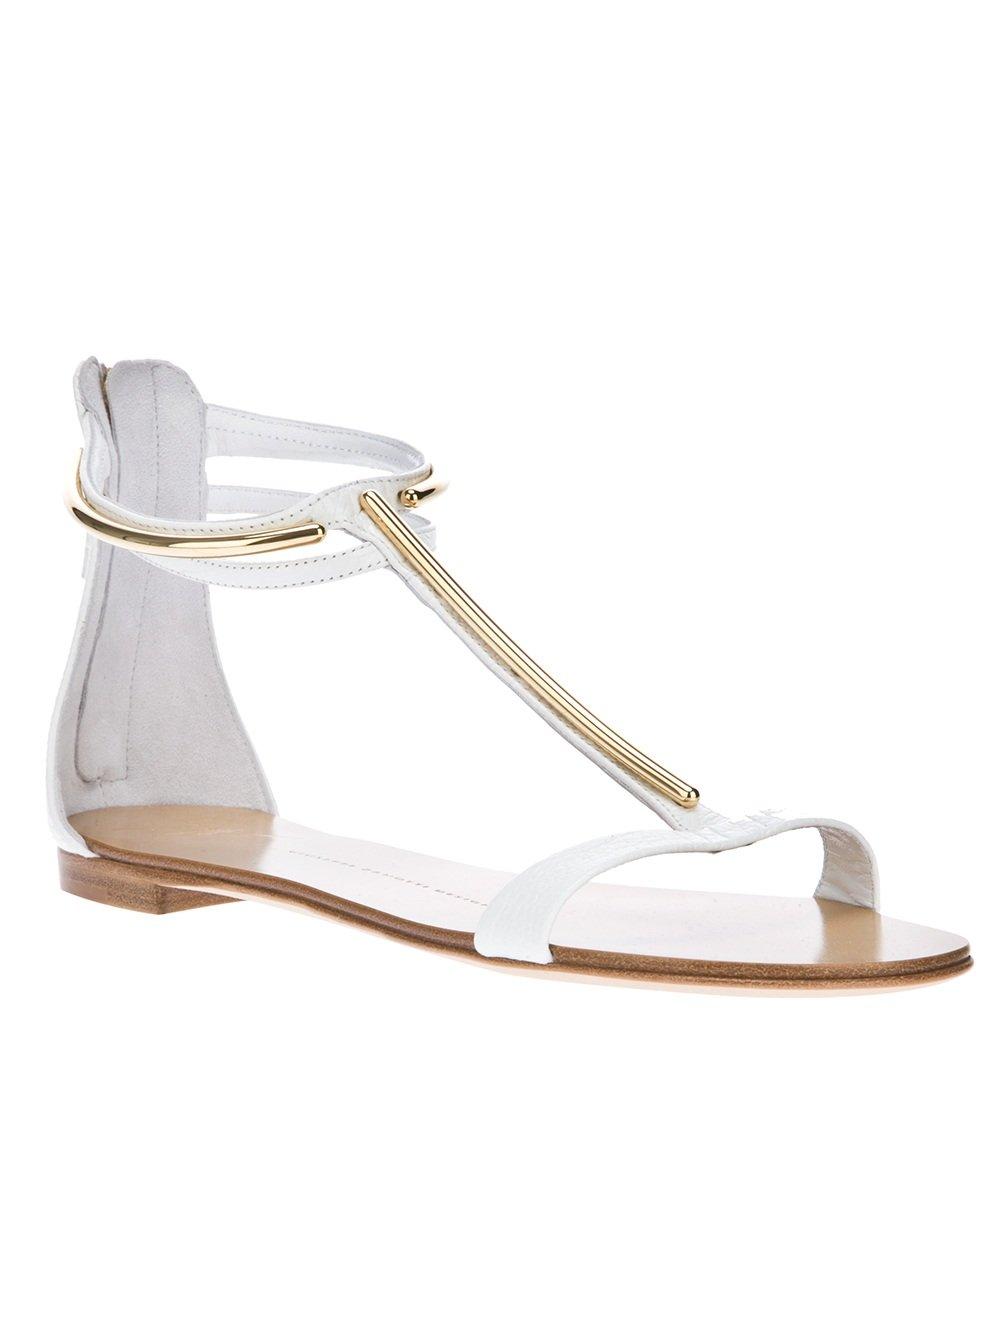 c8d0a06b8 Lyst - Giuseppe Zanotti T-bar Sandal in White